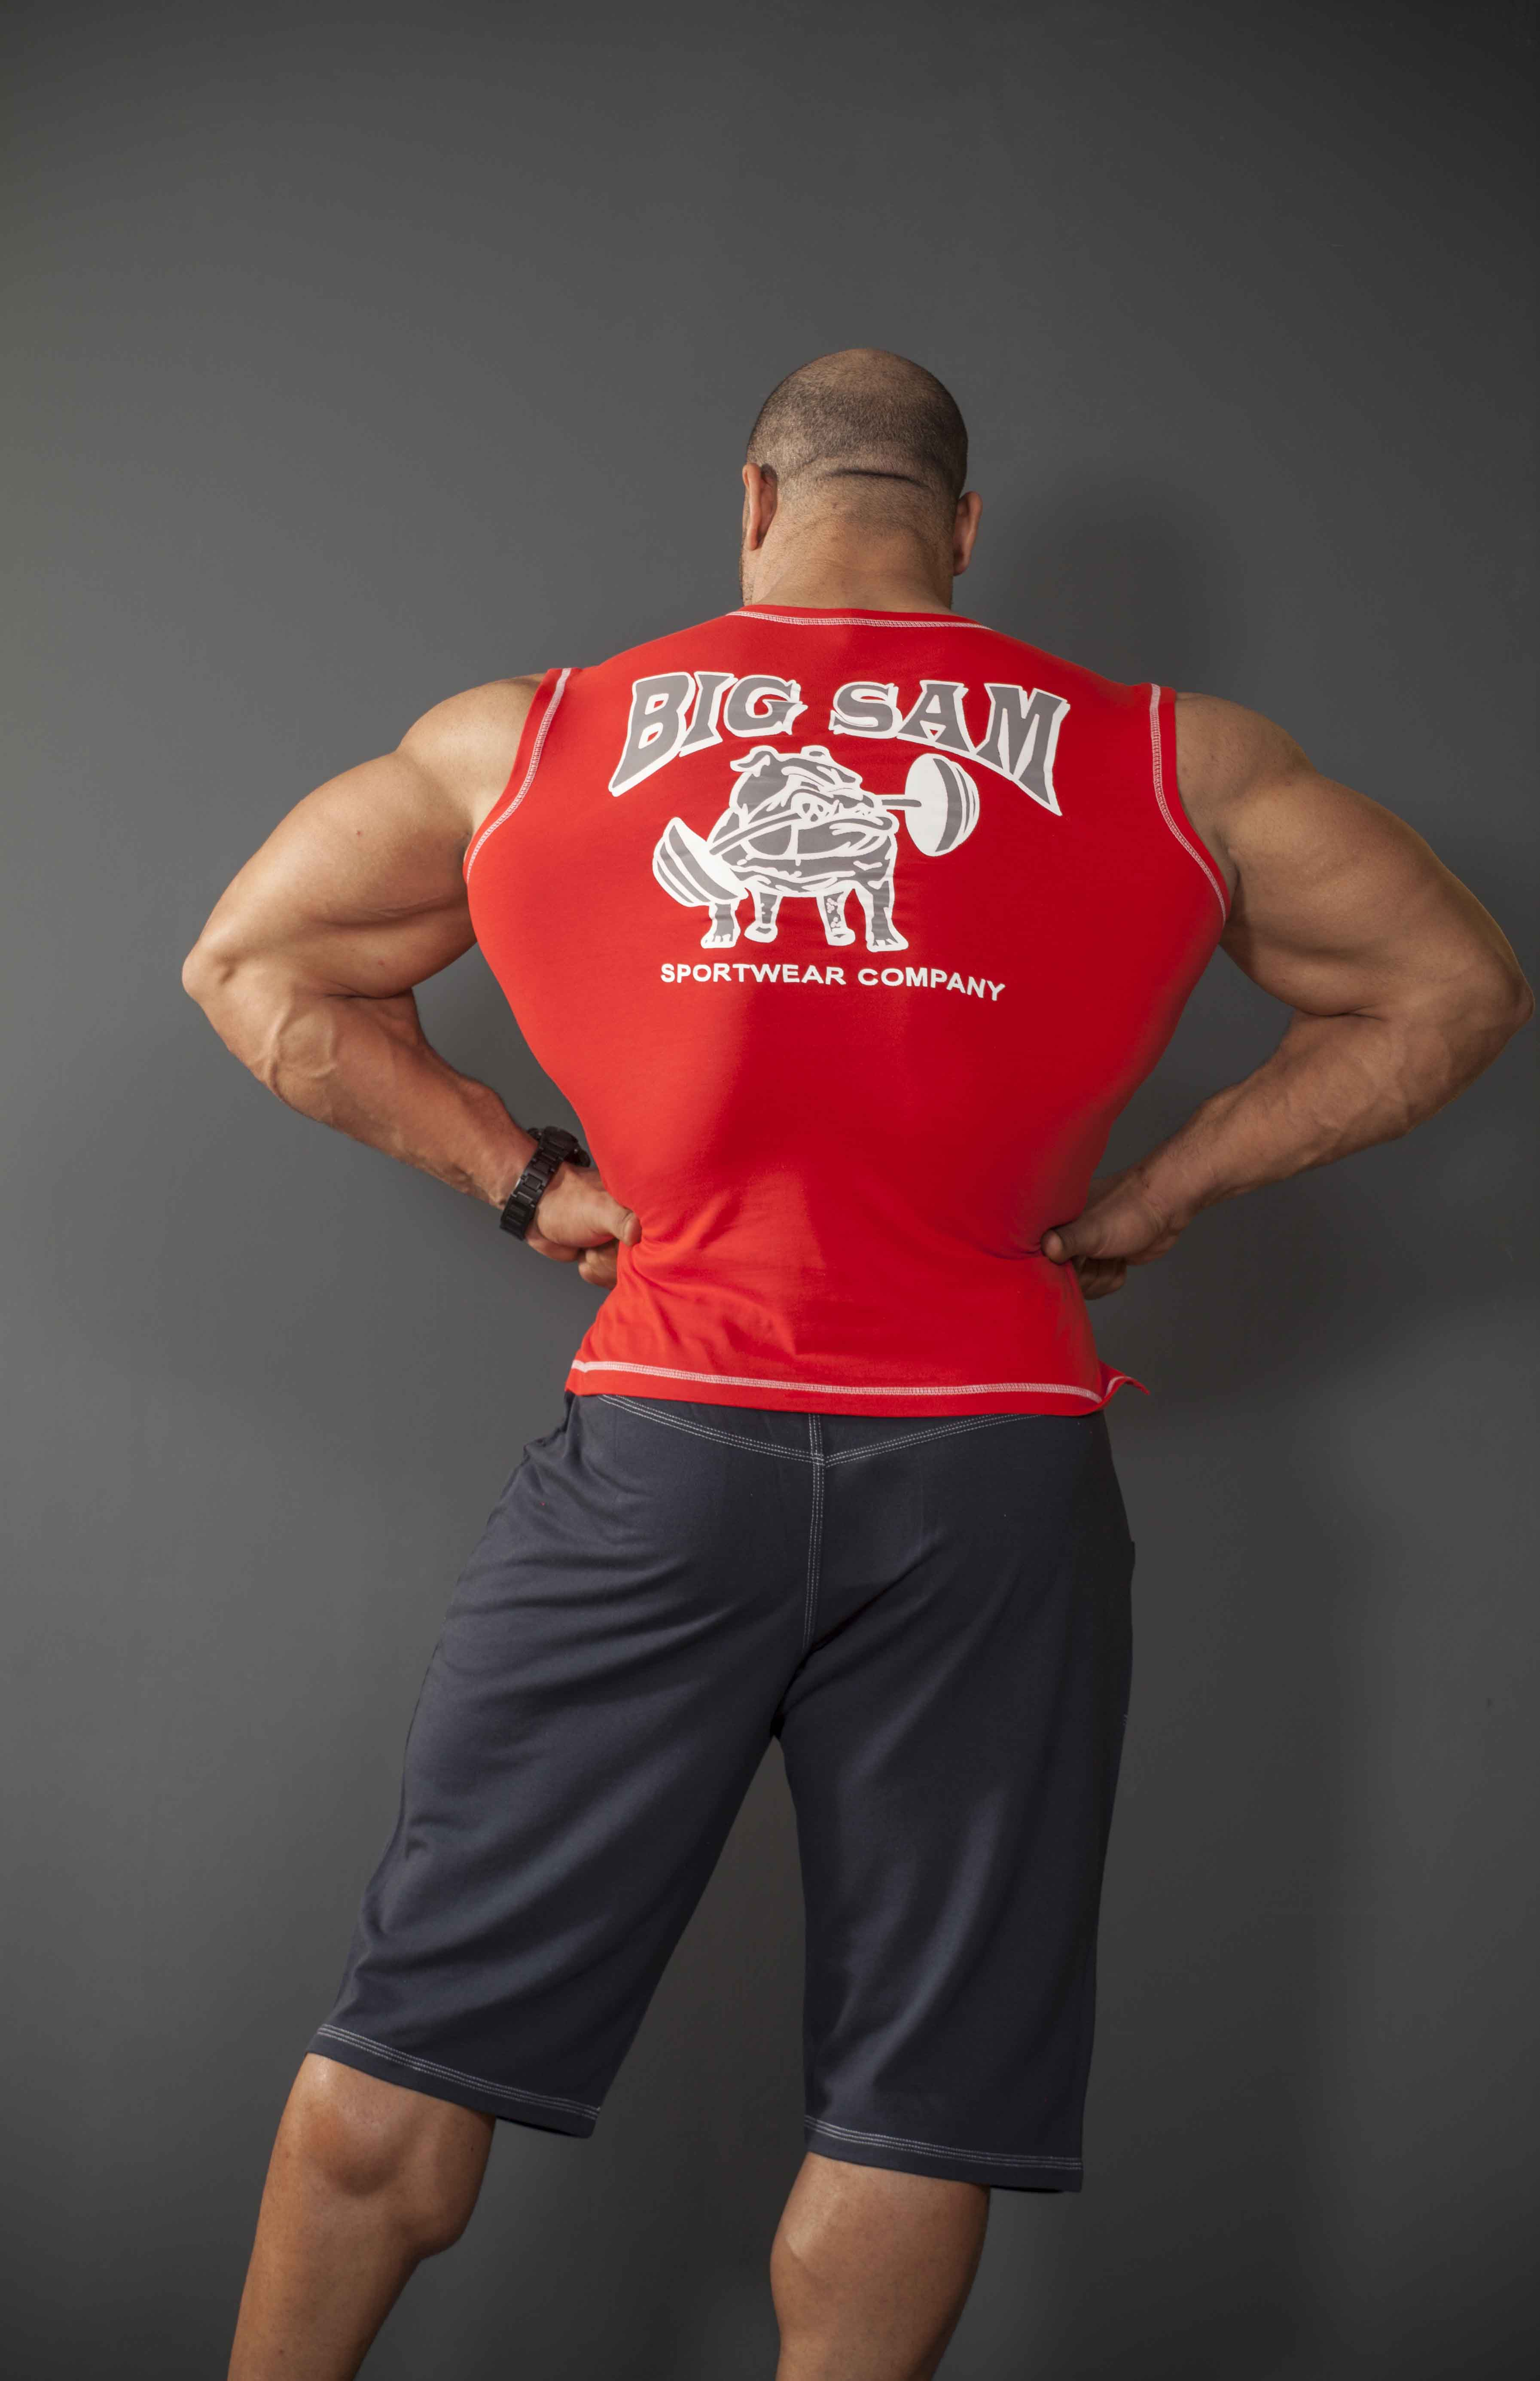 Details about  /BIG SM EXTREME SPORTSWEAR Muscleshirt Tanktop Stringer Bodybuilding 2139